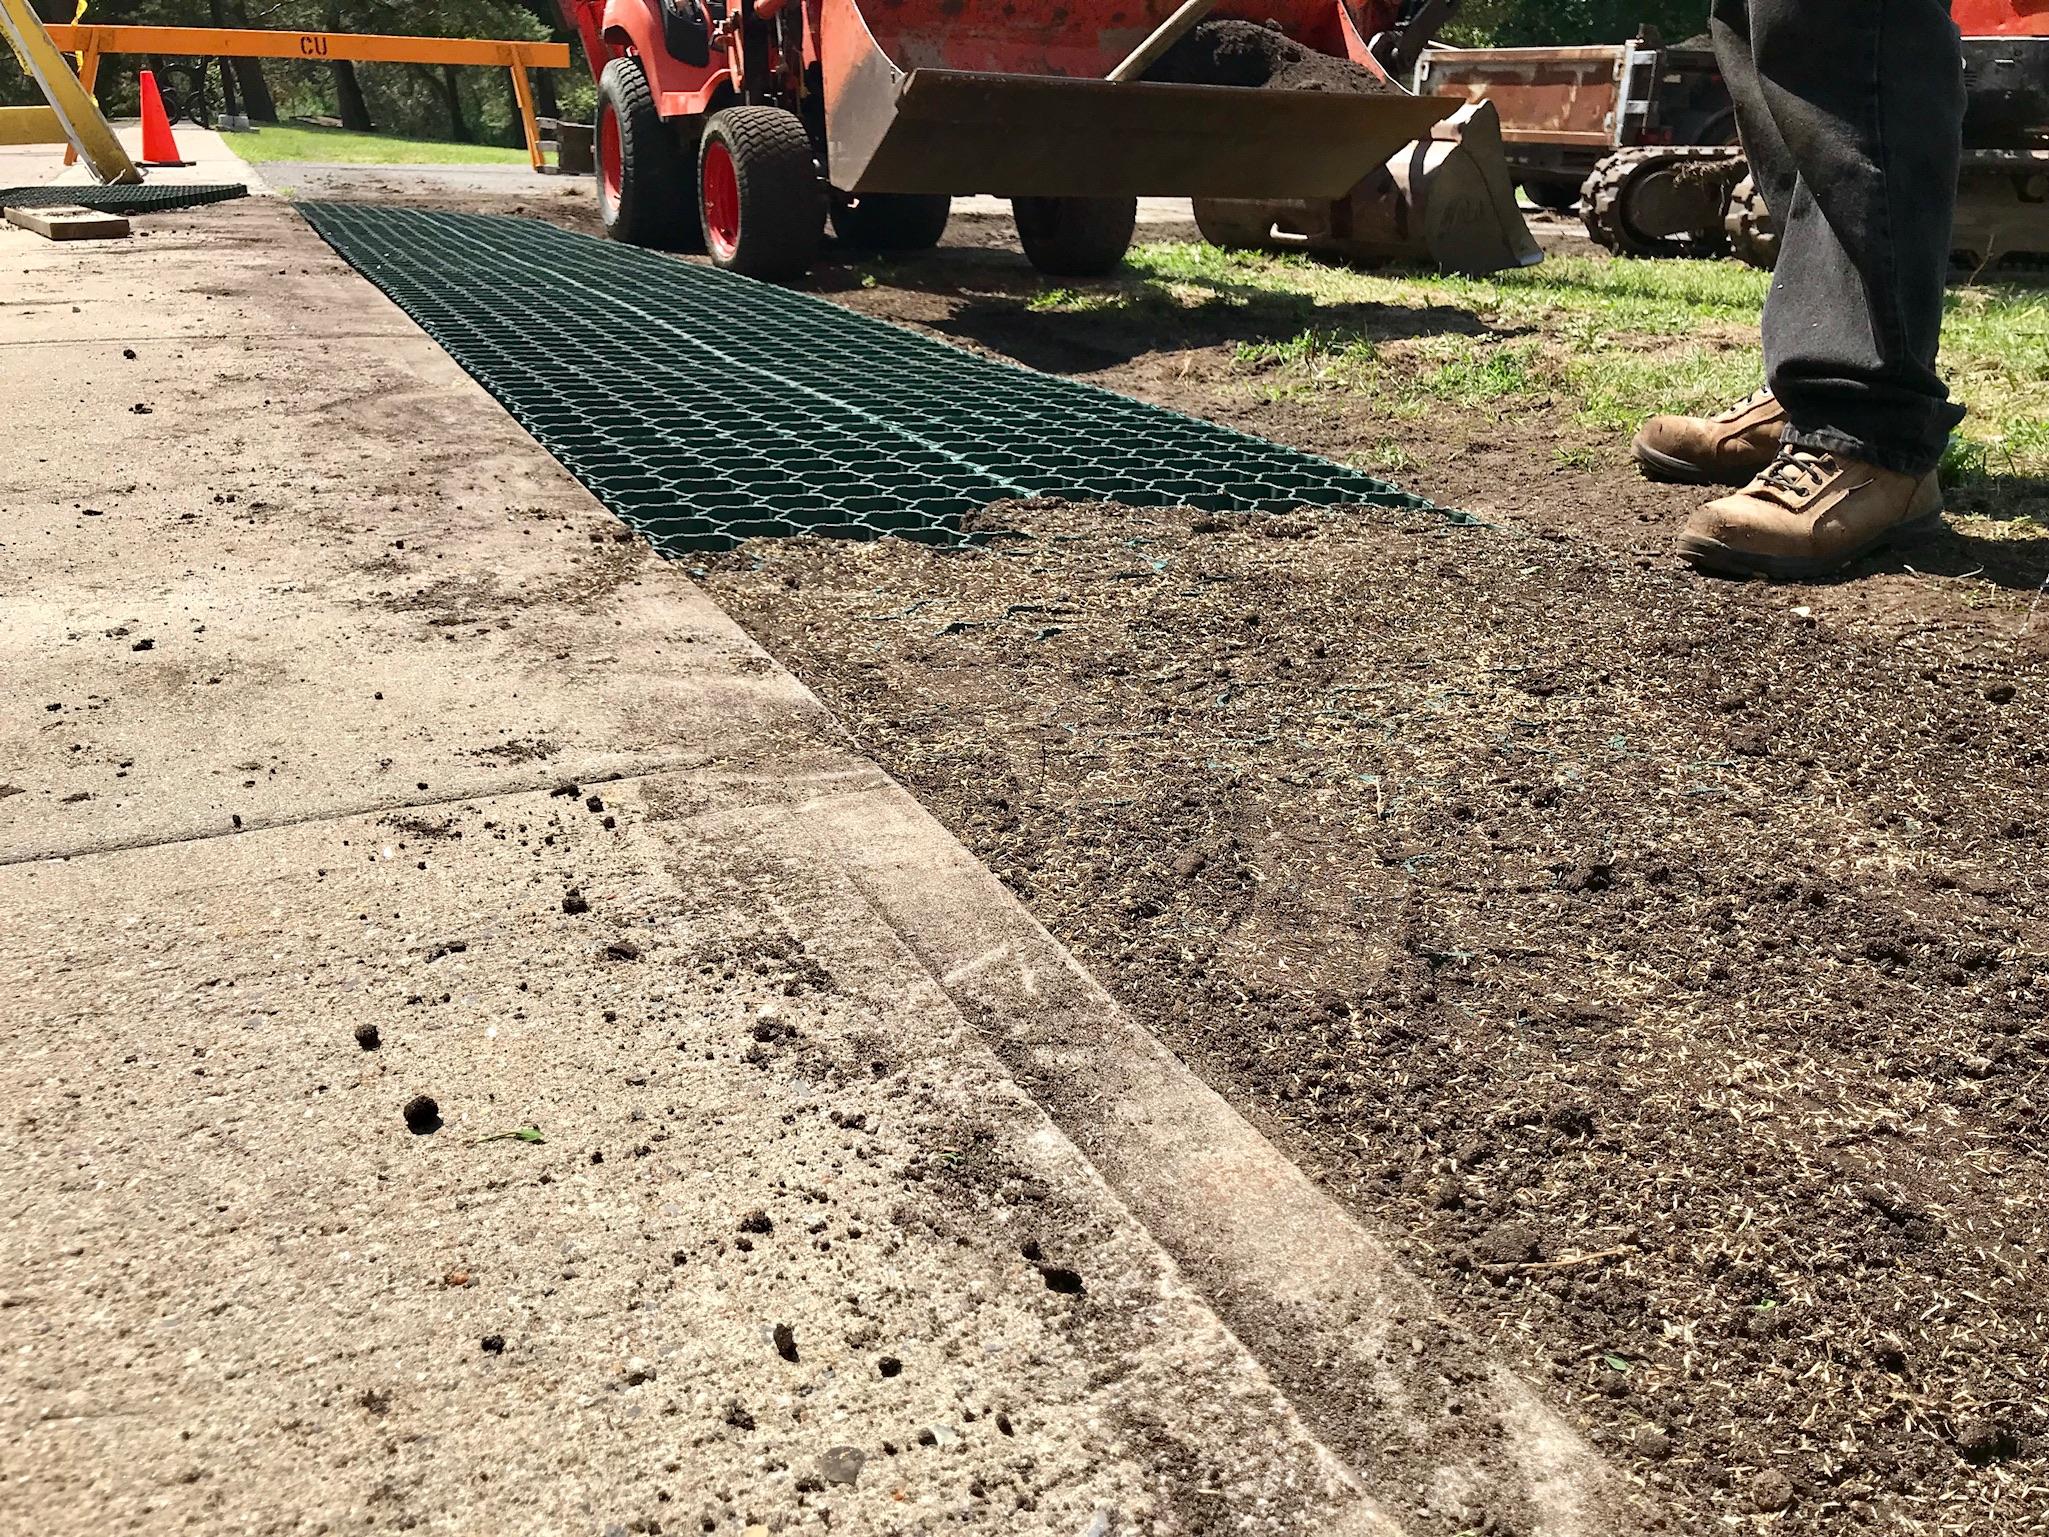 Soft-shoulder reinforcement finished in Grass at Carleton University, Ottawa 2018